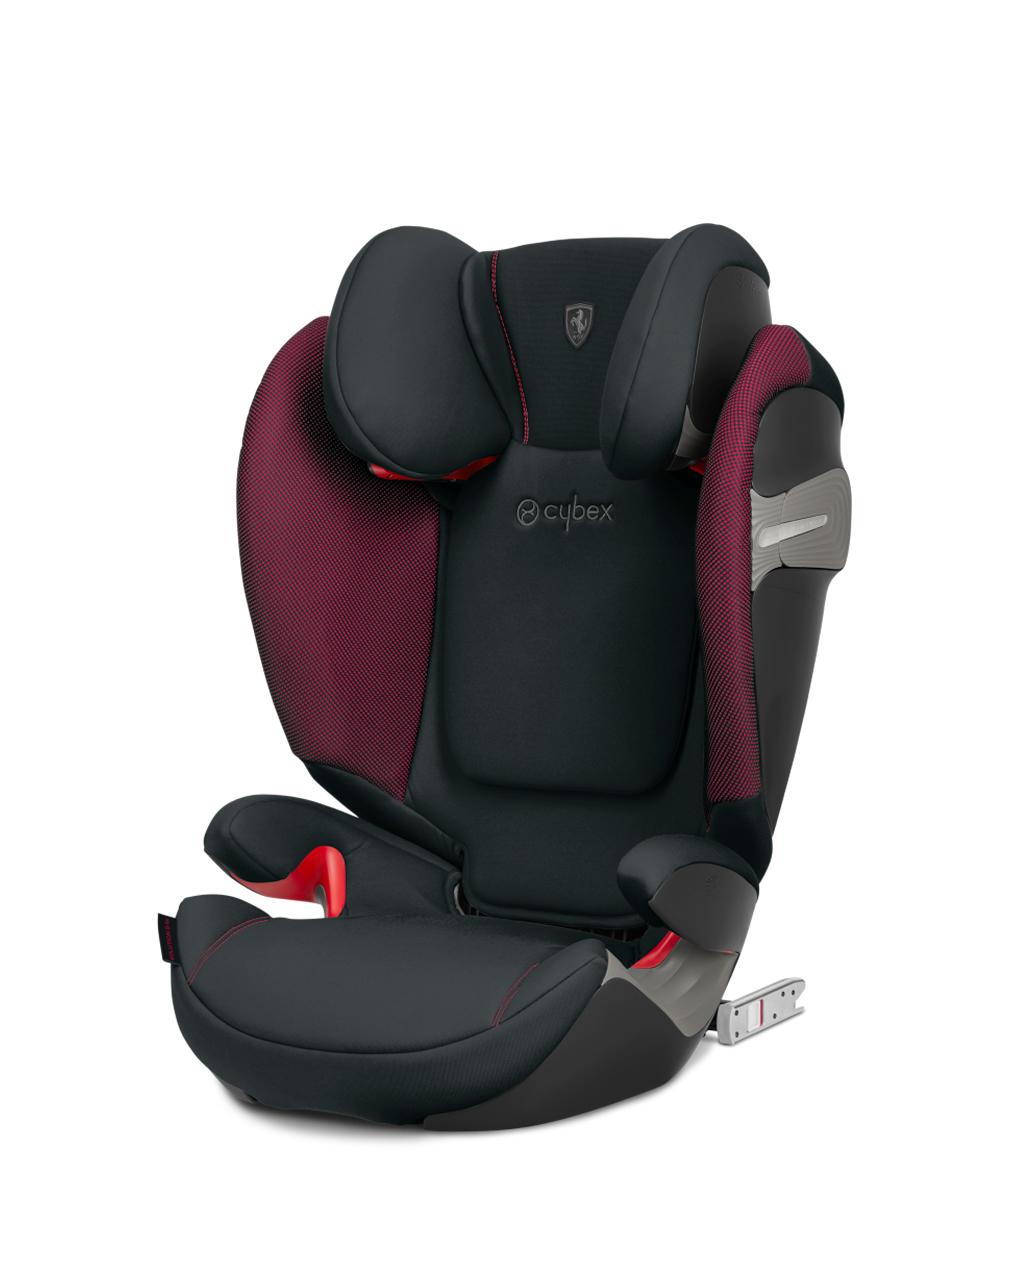 Cybex Κάθισμα Αυτοκινήτου Solution S-Fix, 15-36 Kg Victory Black